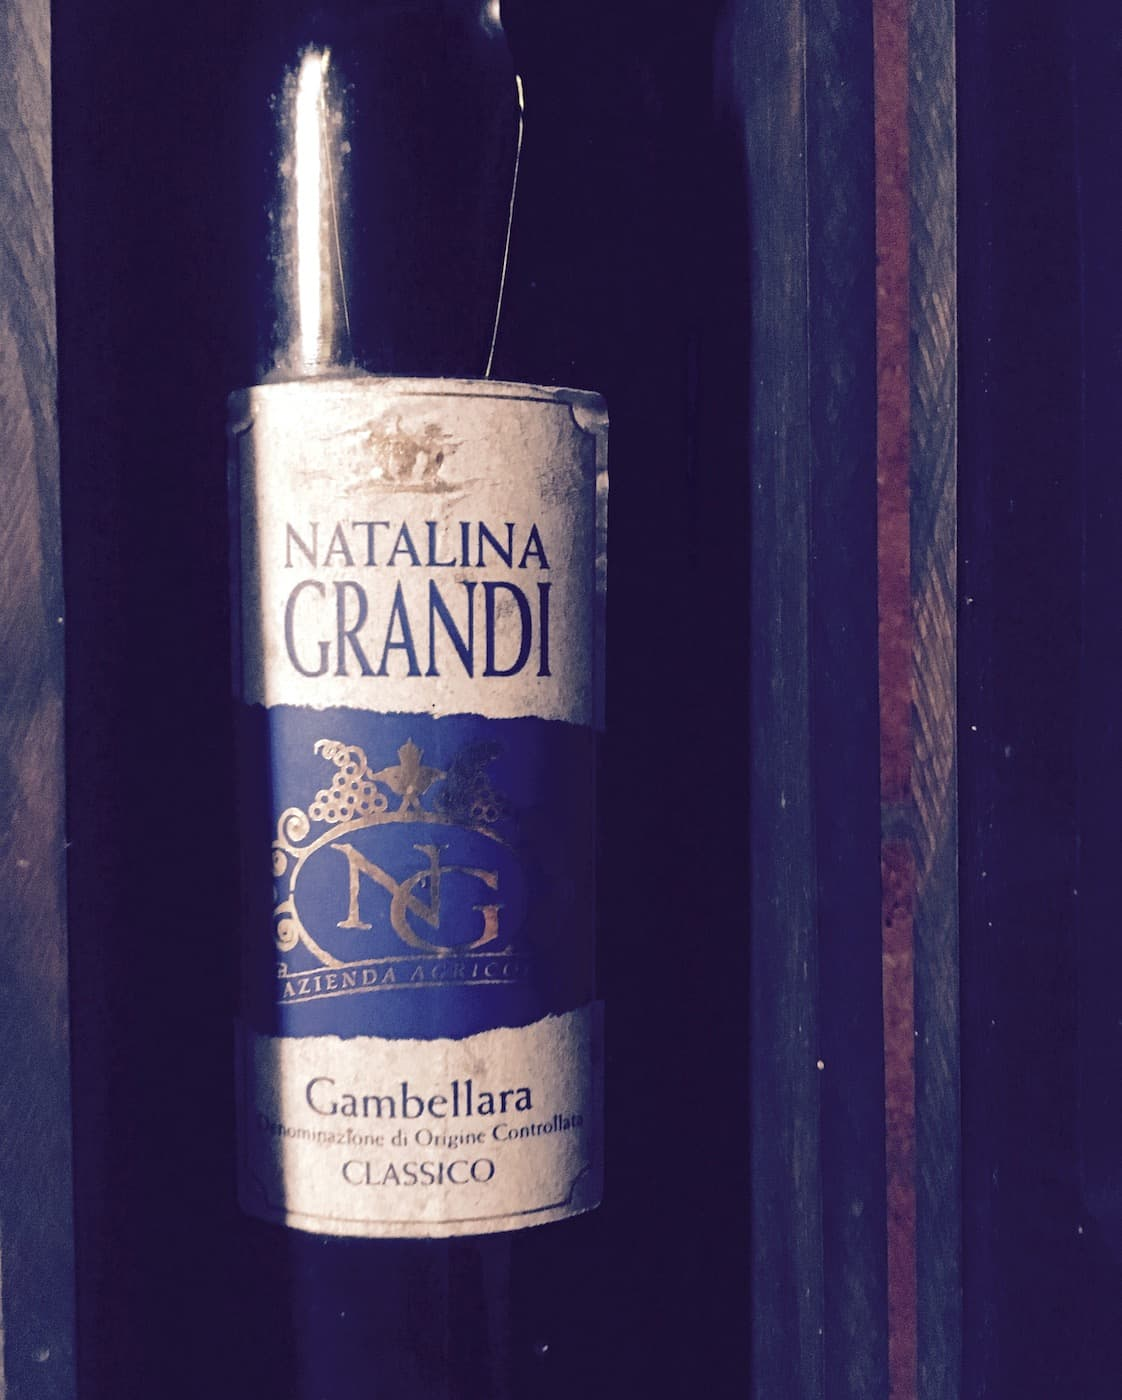 Tenuta Natalina Grandi Winery in Gambellara